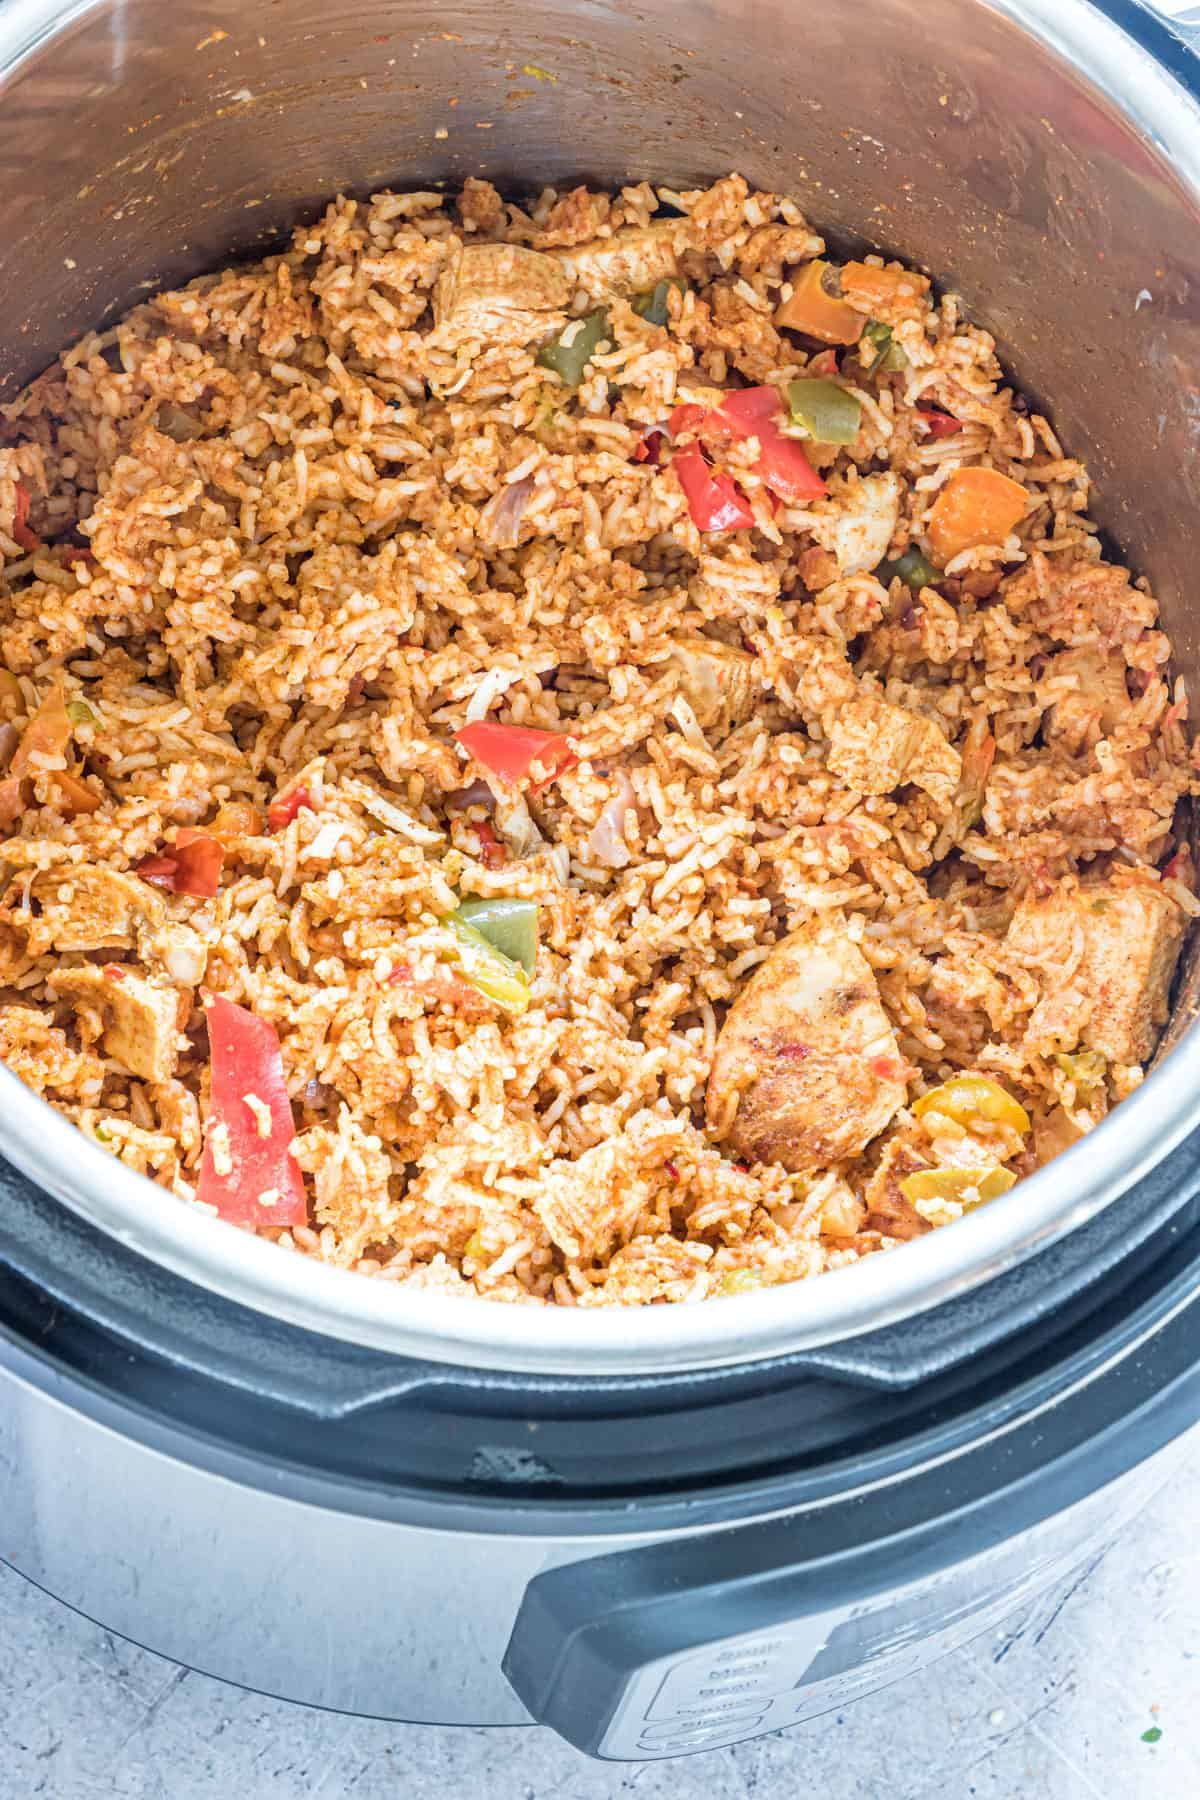 the completed fajita rice instant pot recipe